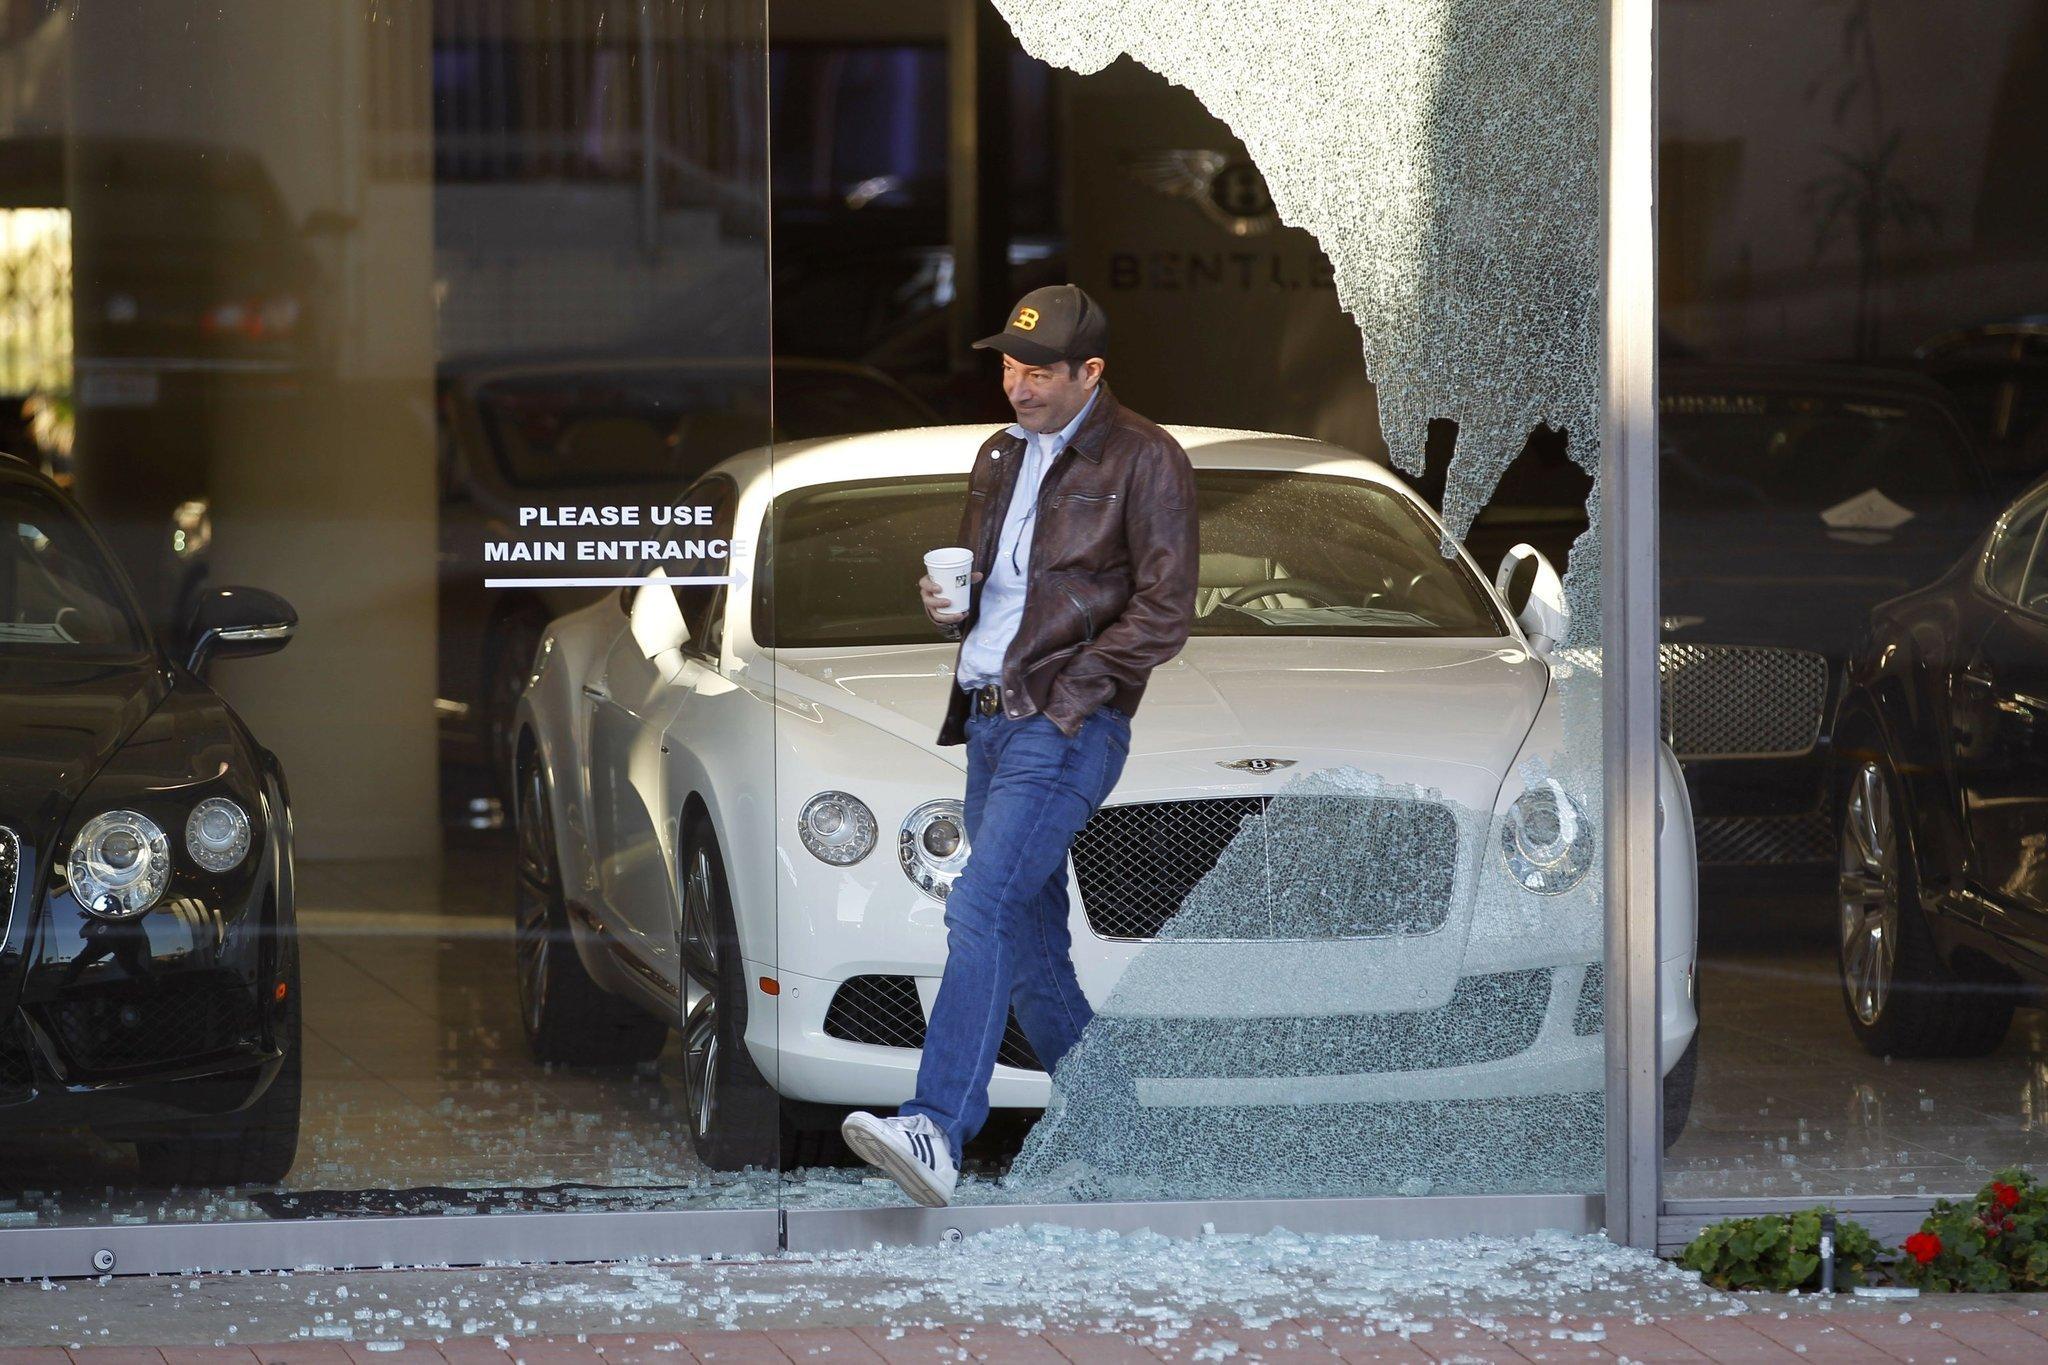 Car Dealer Linked To Funding Scandal The San Diego Union Tribune